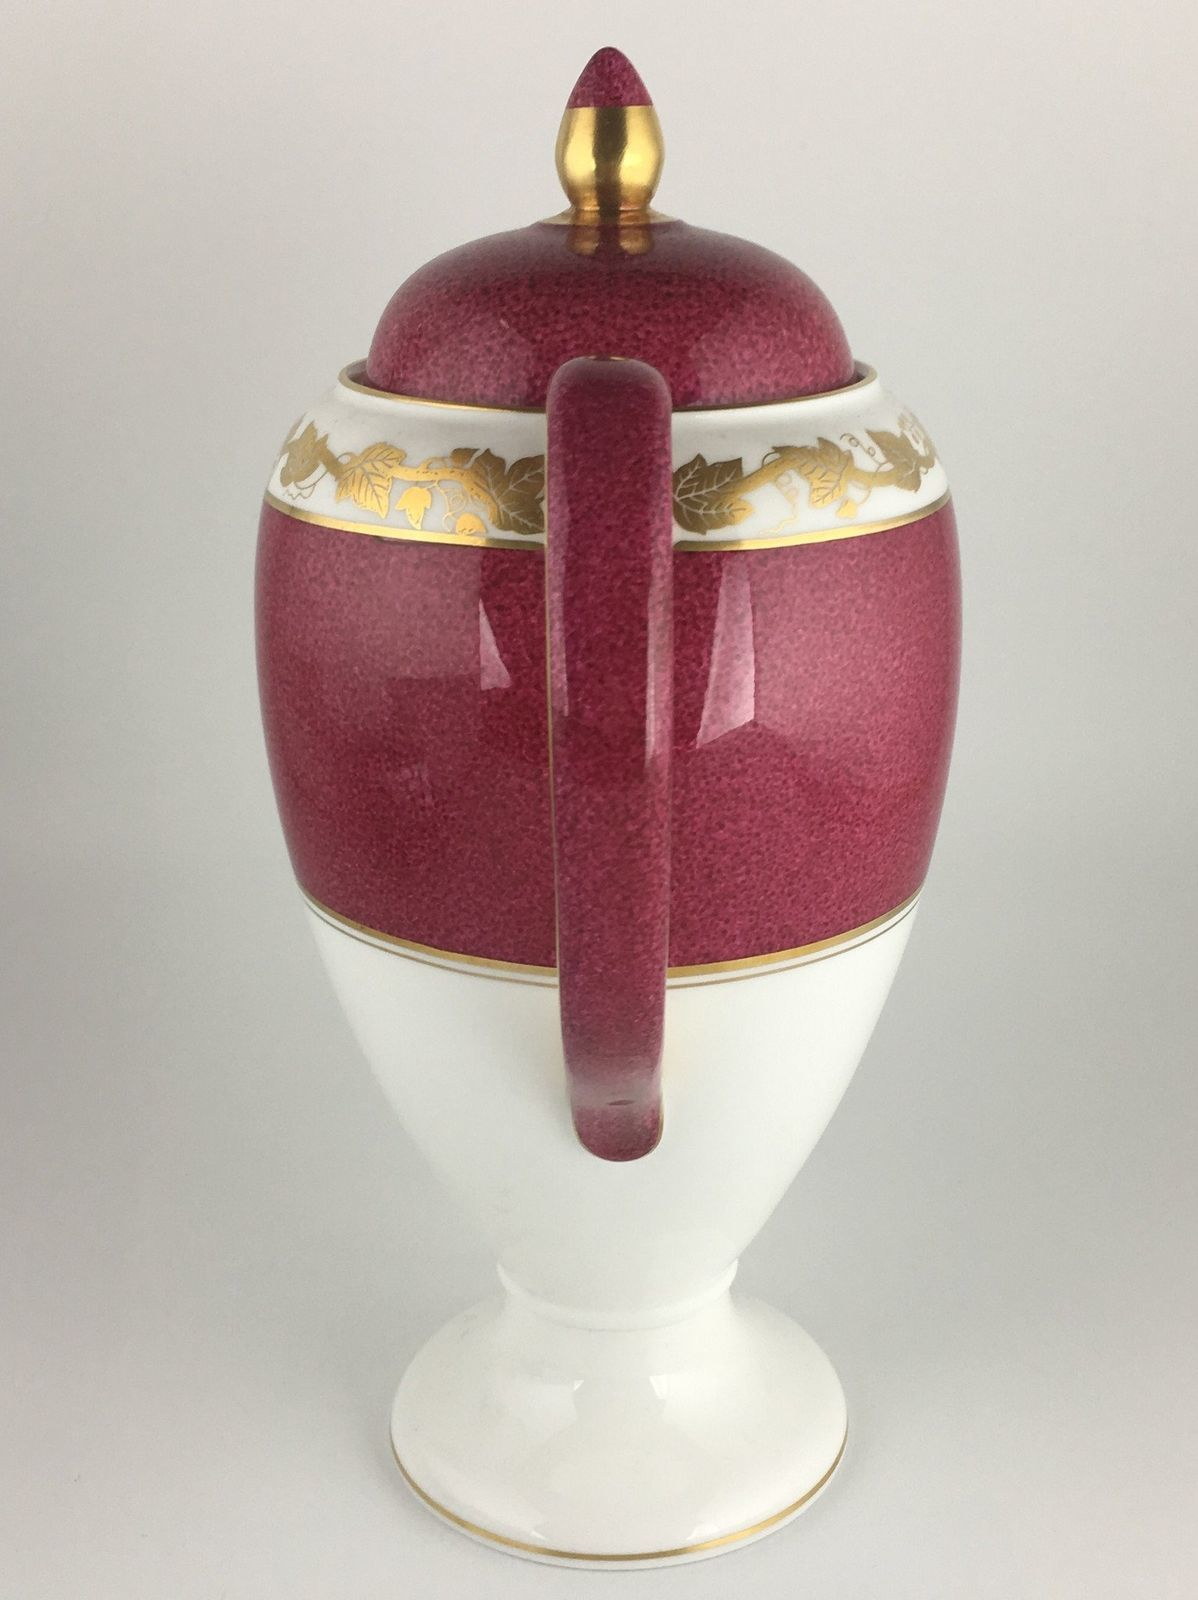 Wedgwood Whitehall Ruby W3994 Coffee pot & lid image 3